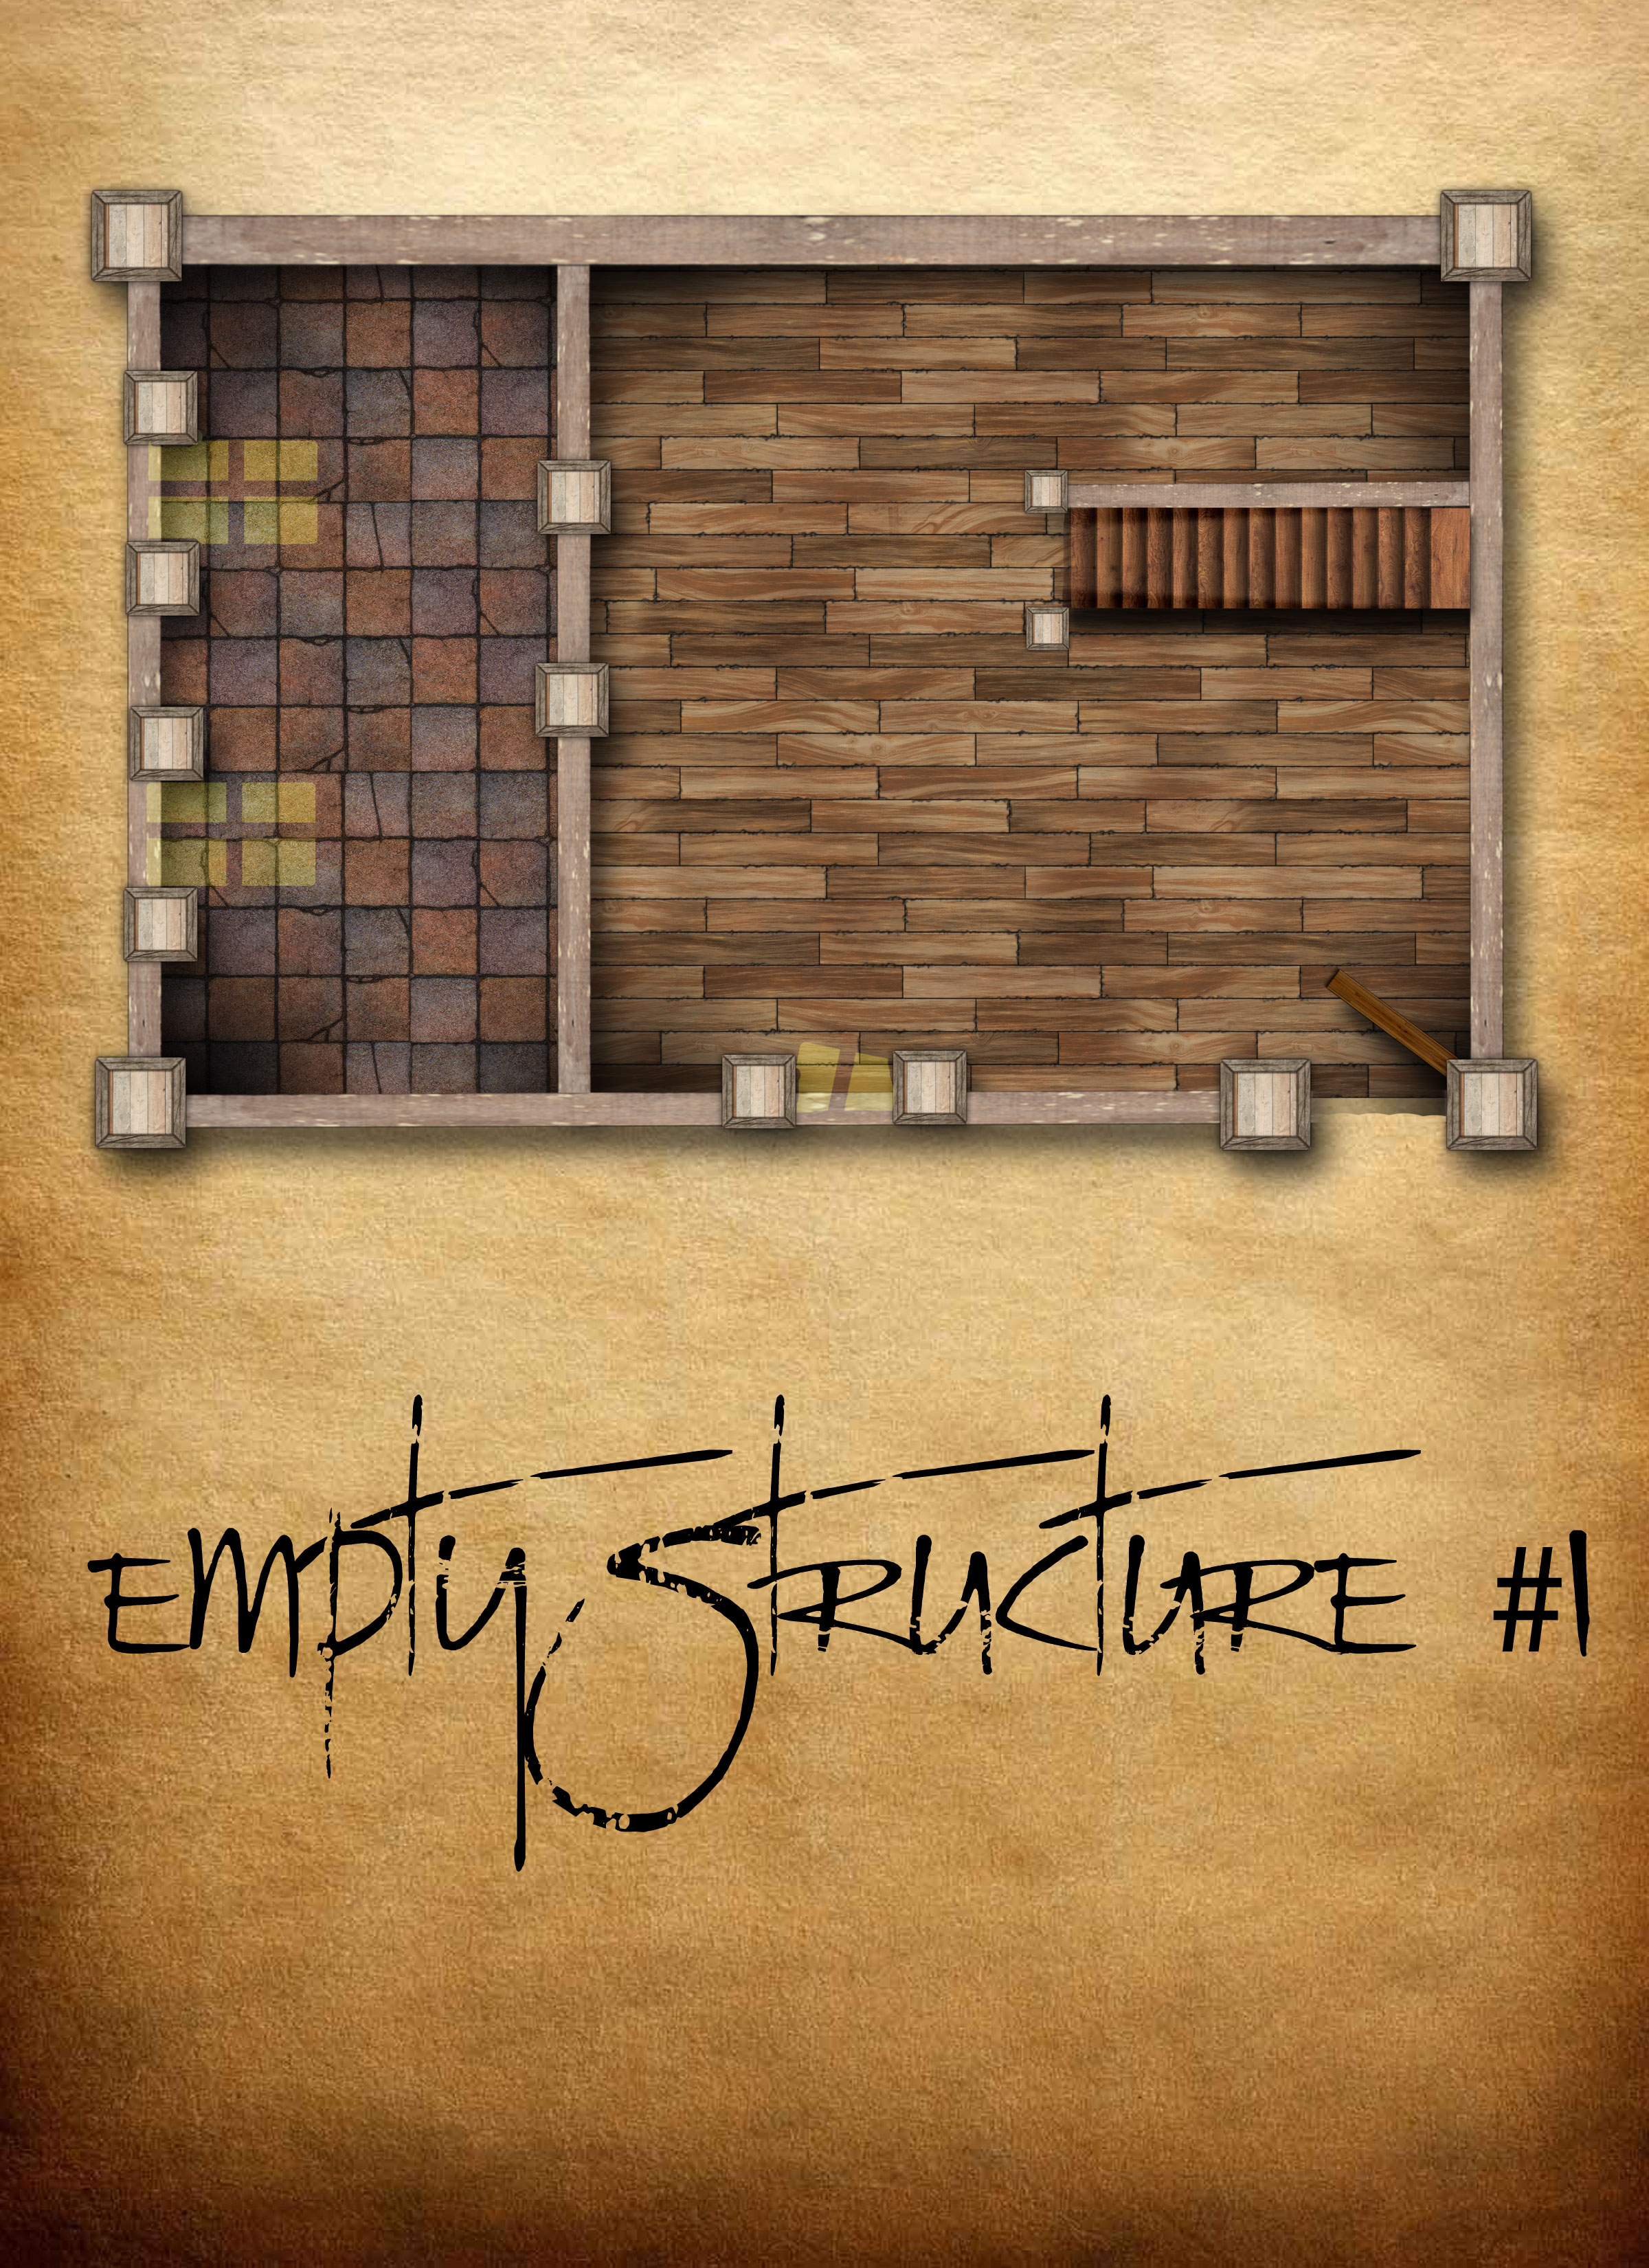 Empty Structure #1 by ladnamedfelix by ladnamedfelix